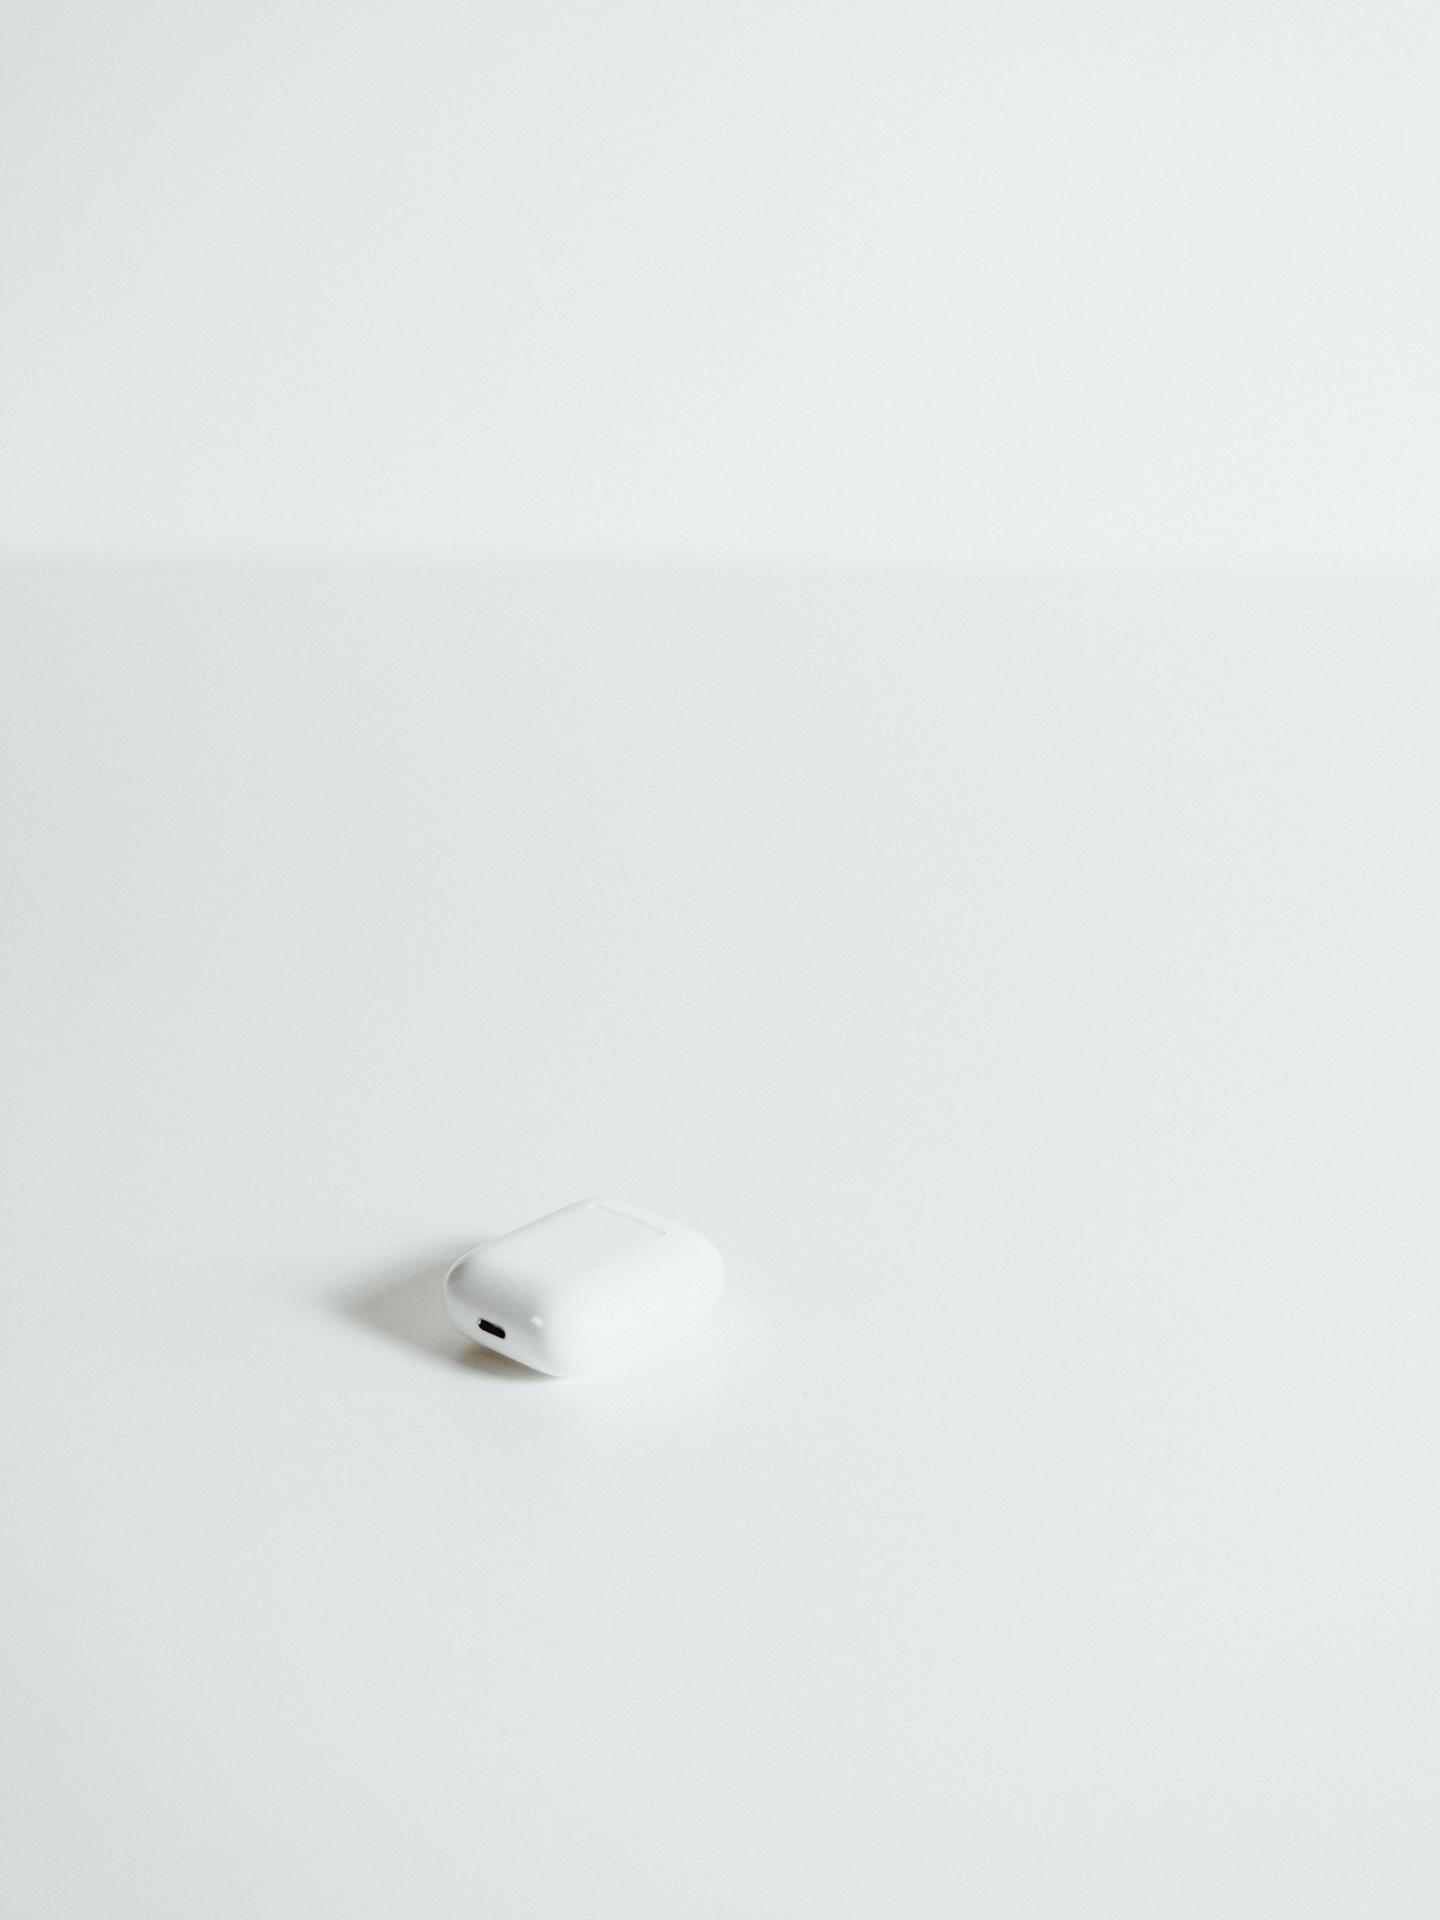 Apple-AirPods-23.jpg